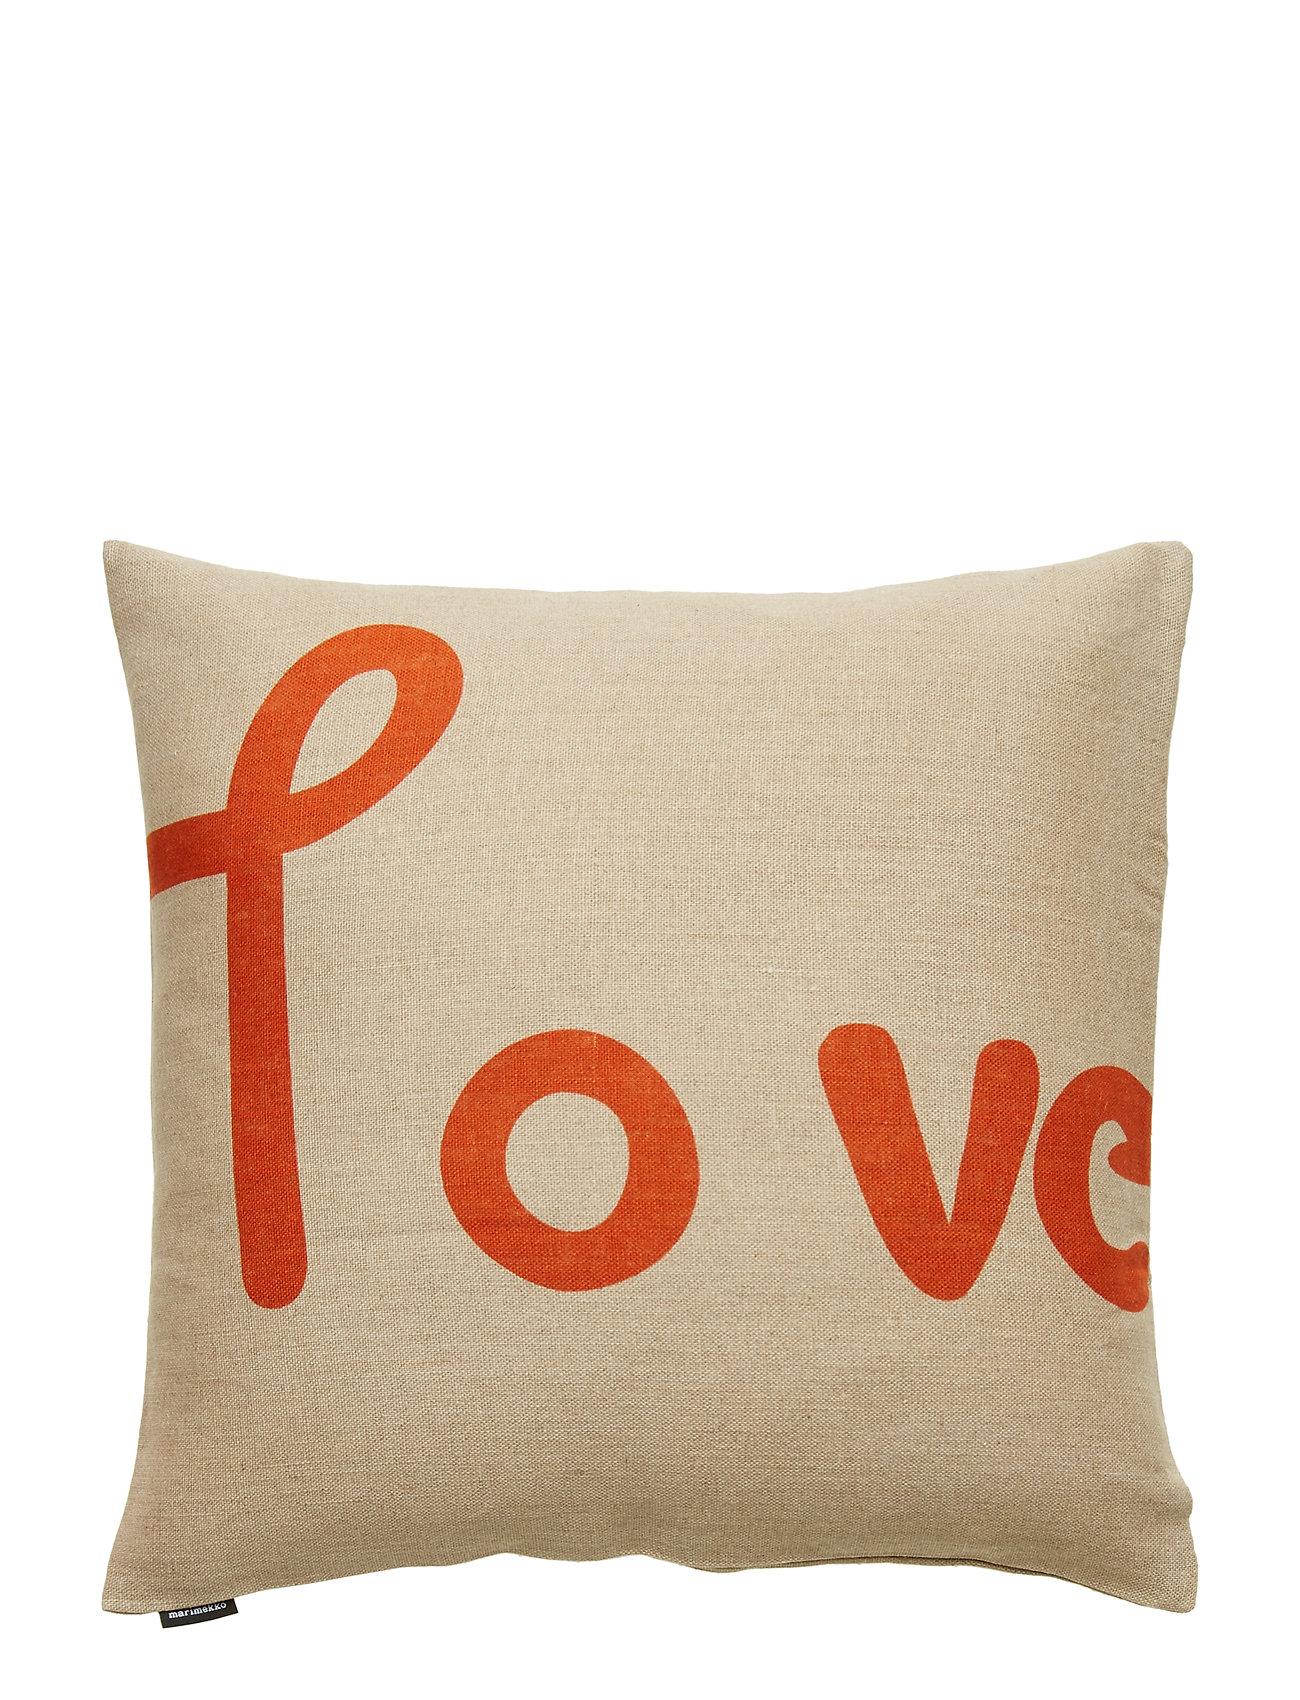 Marimekko Home LOVE CUSHION COVER - LINEN, ORANGE